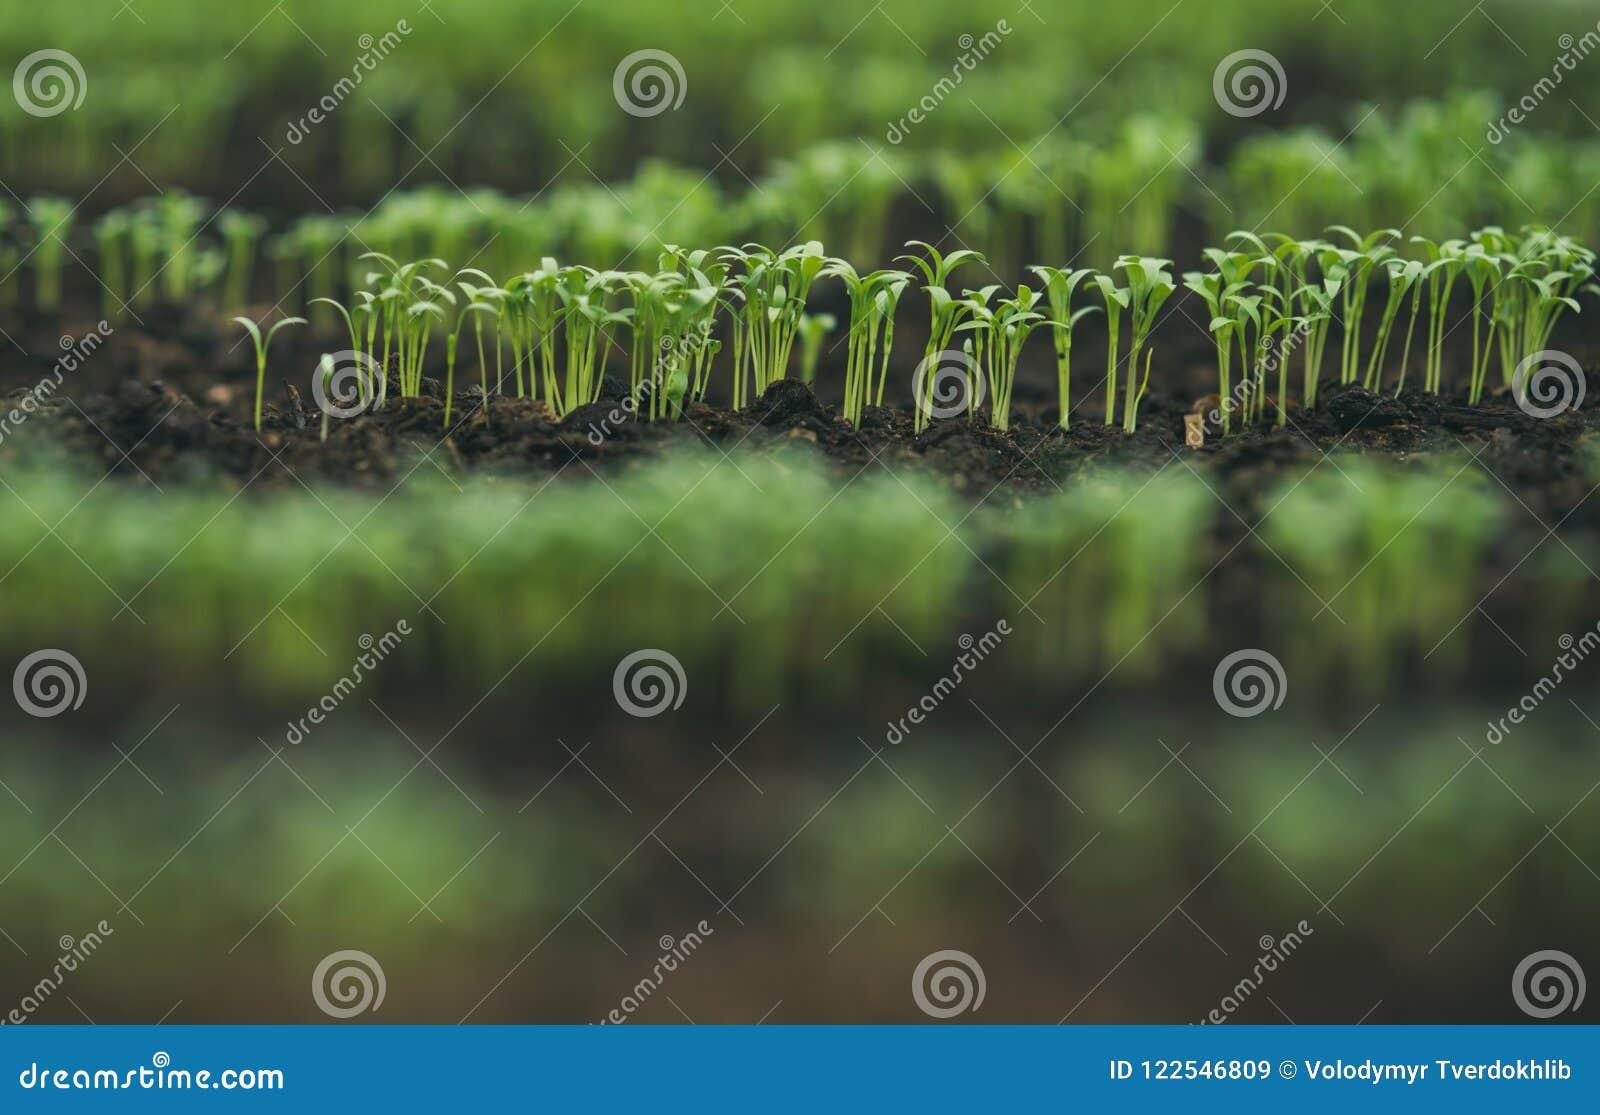 Seeding in greenhouse. seeding plants greenhouse. seeding in greenhouse concept. plant seeding in greenhouse. new life.